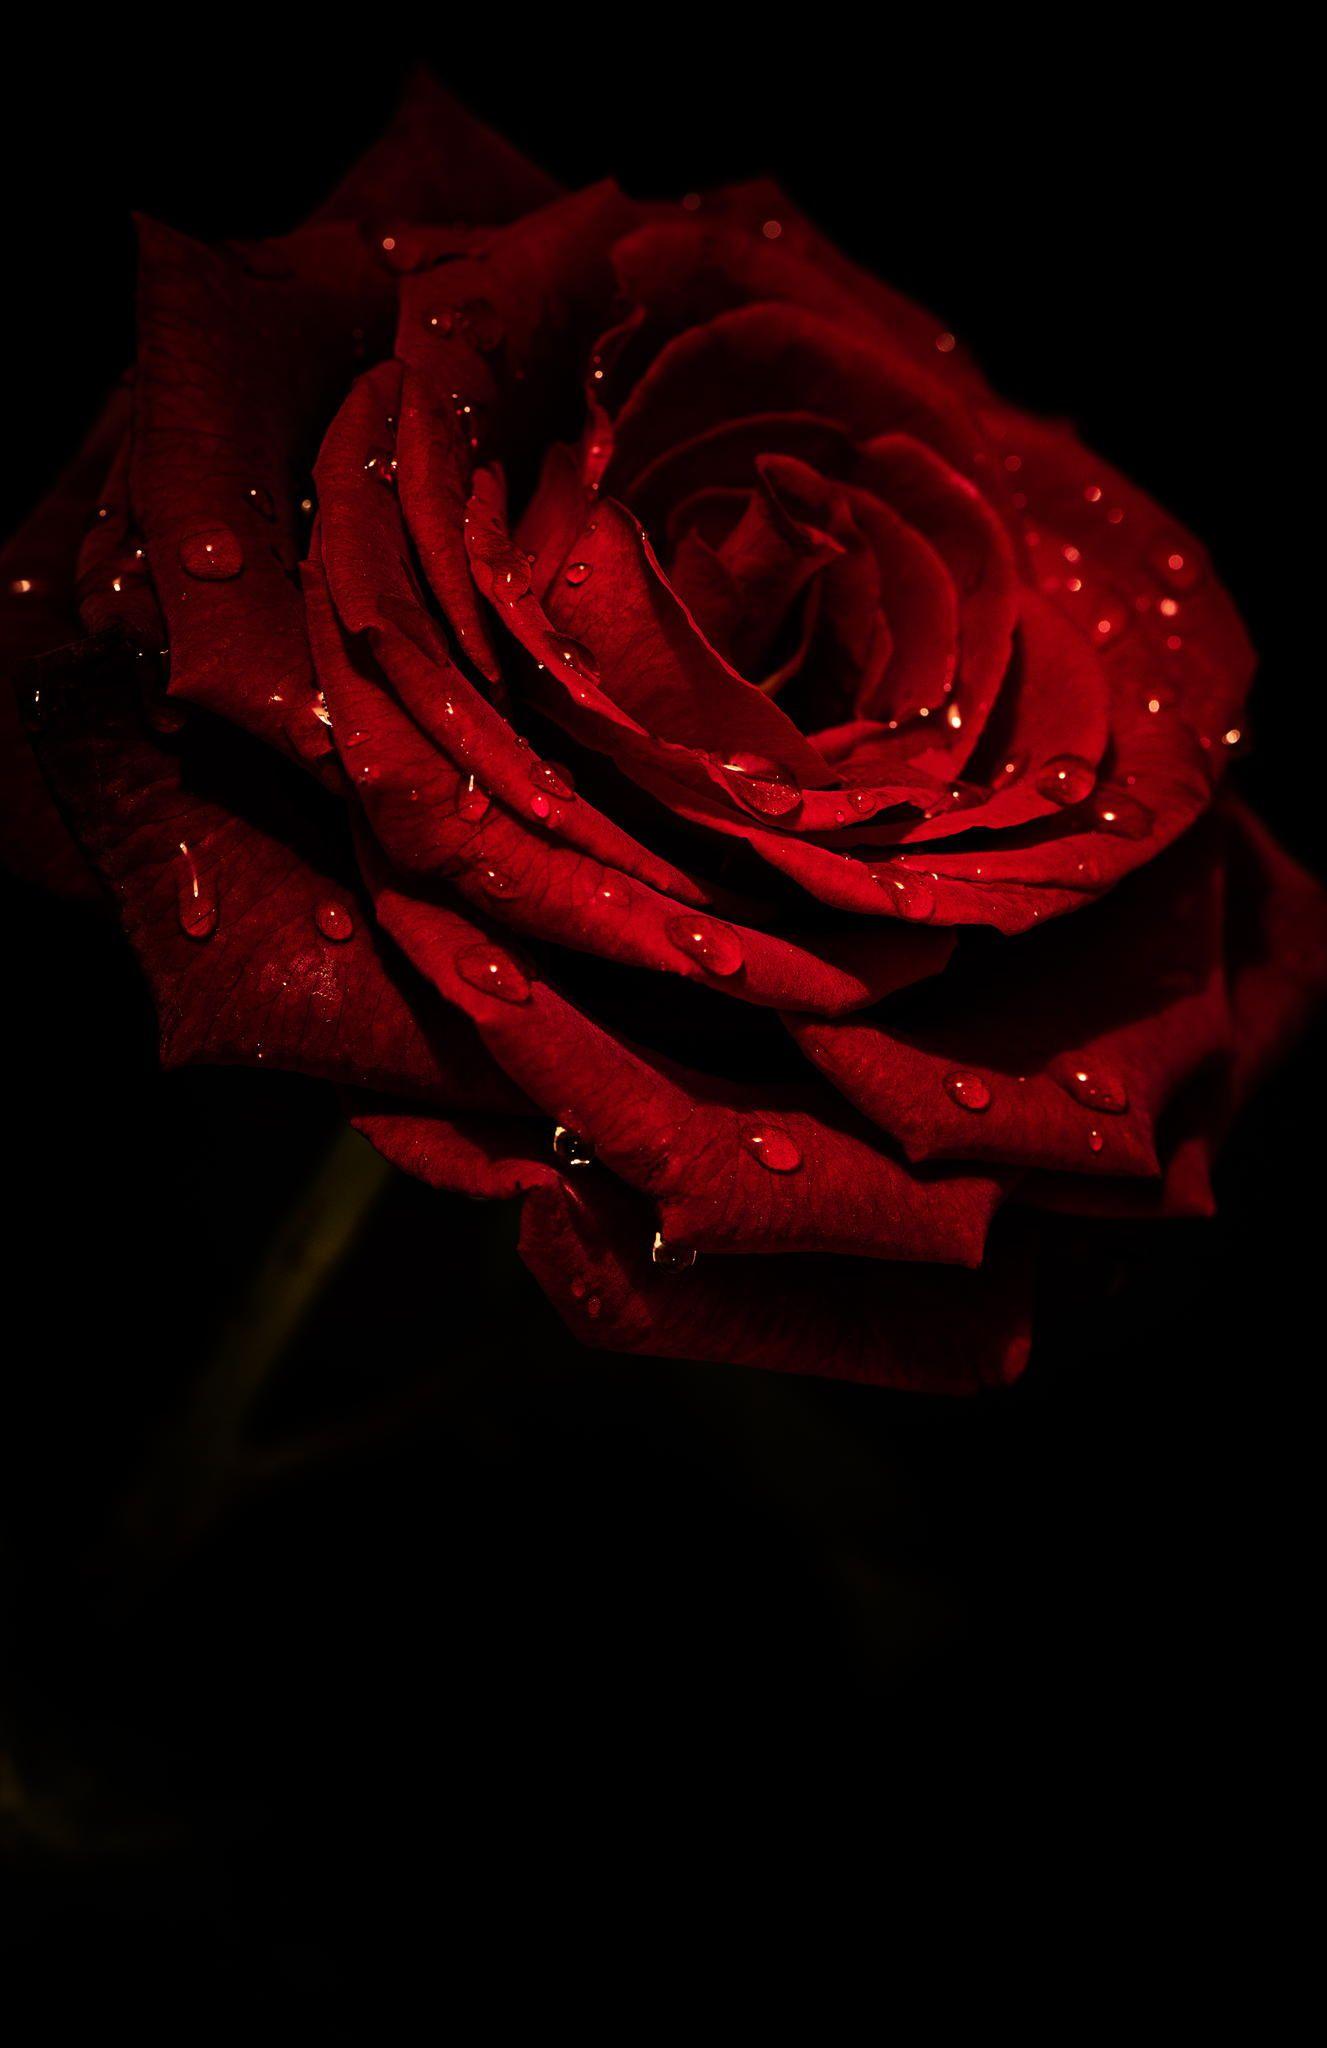 Rose Ii Rose Flower Wallpaper Red Rose Pictures Red Roses Wallpaper